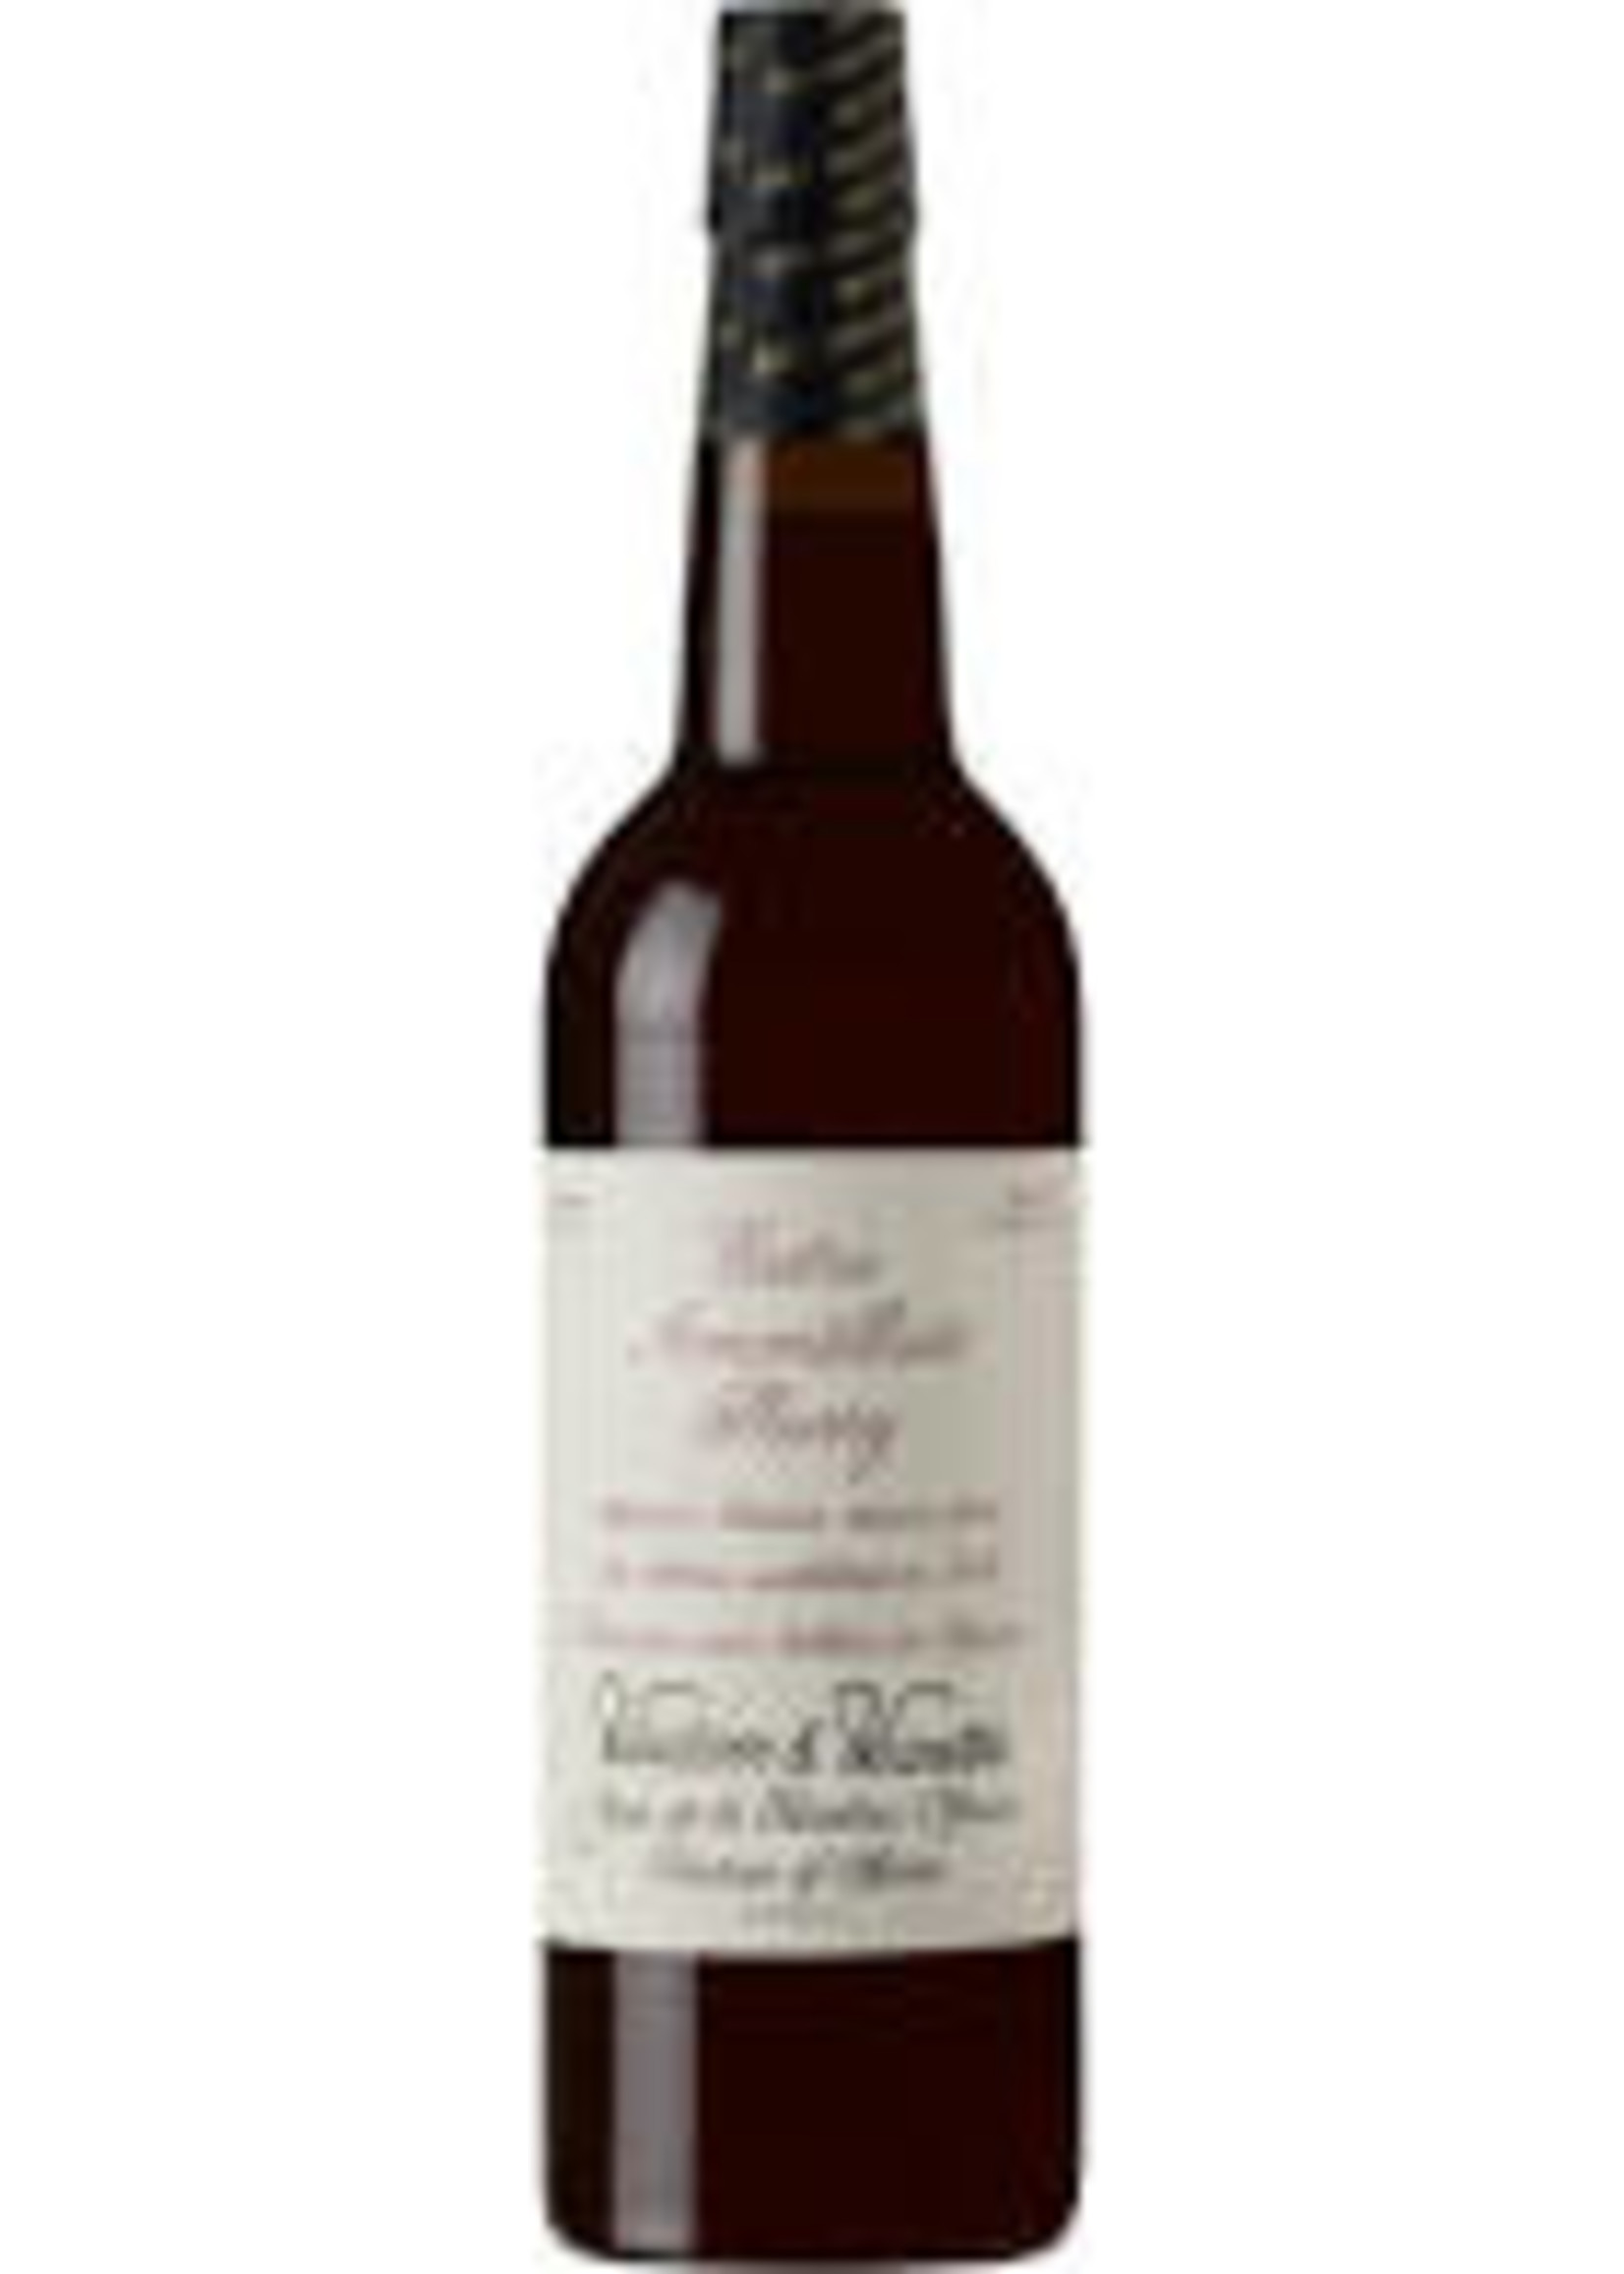 Wisdom & Warter Extra Amontillado Sherry